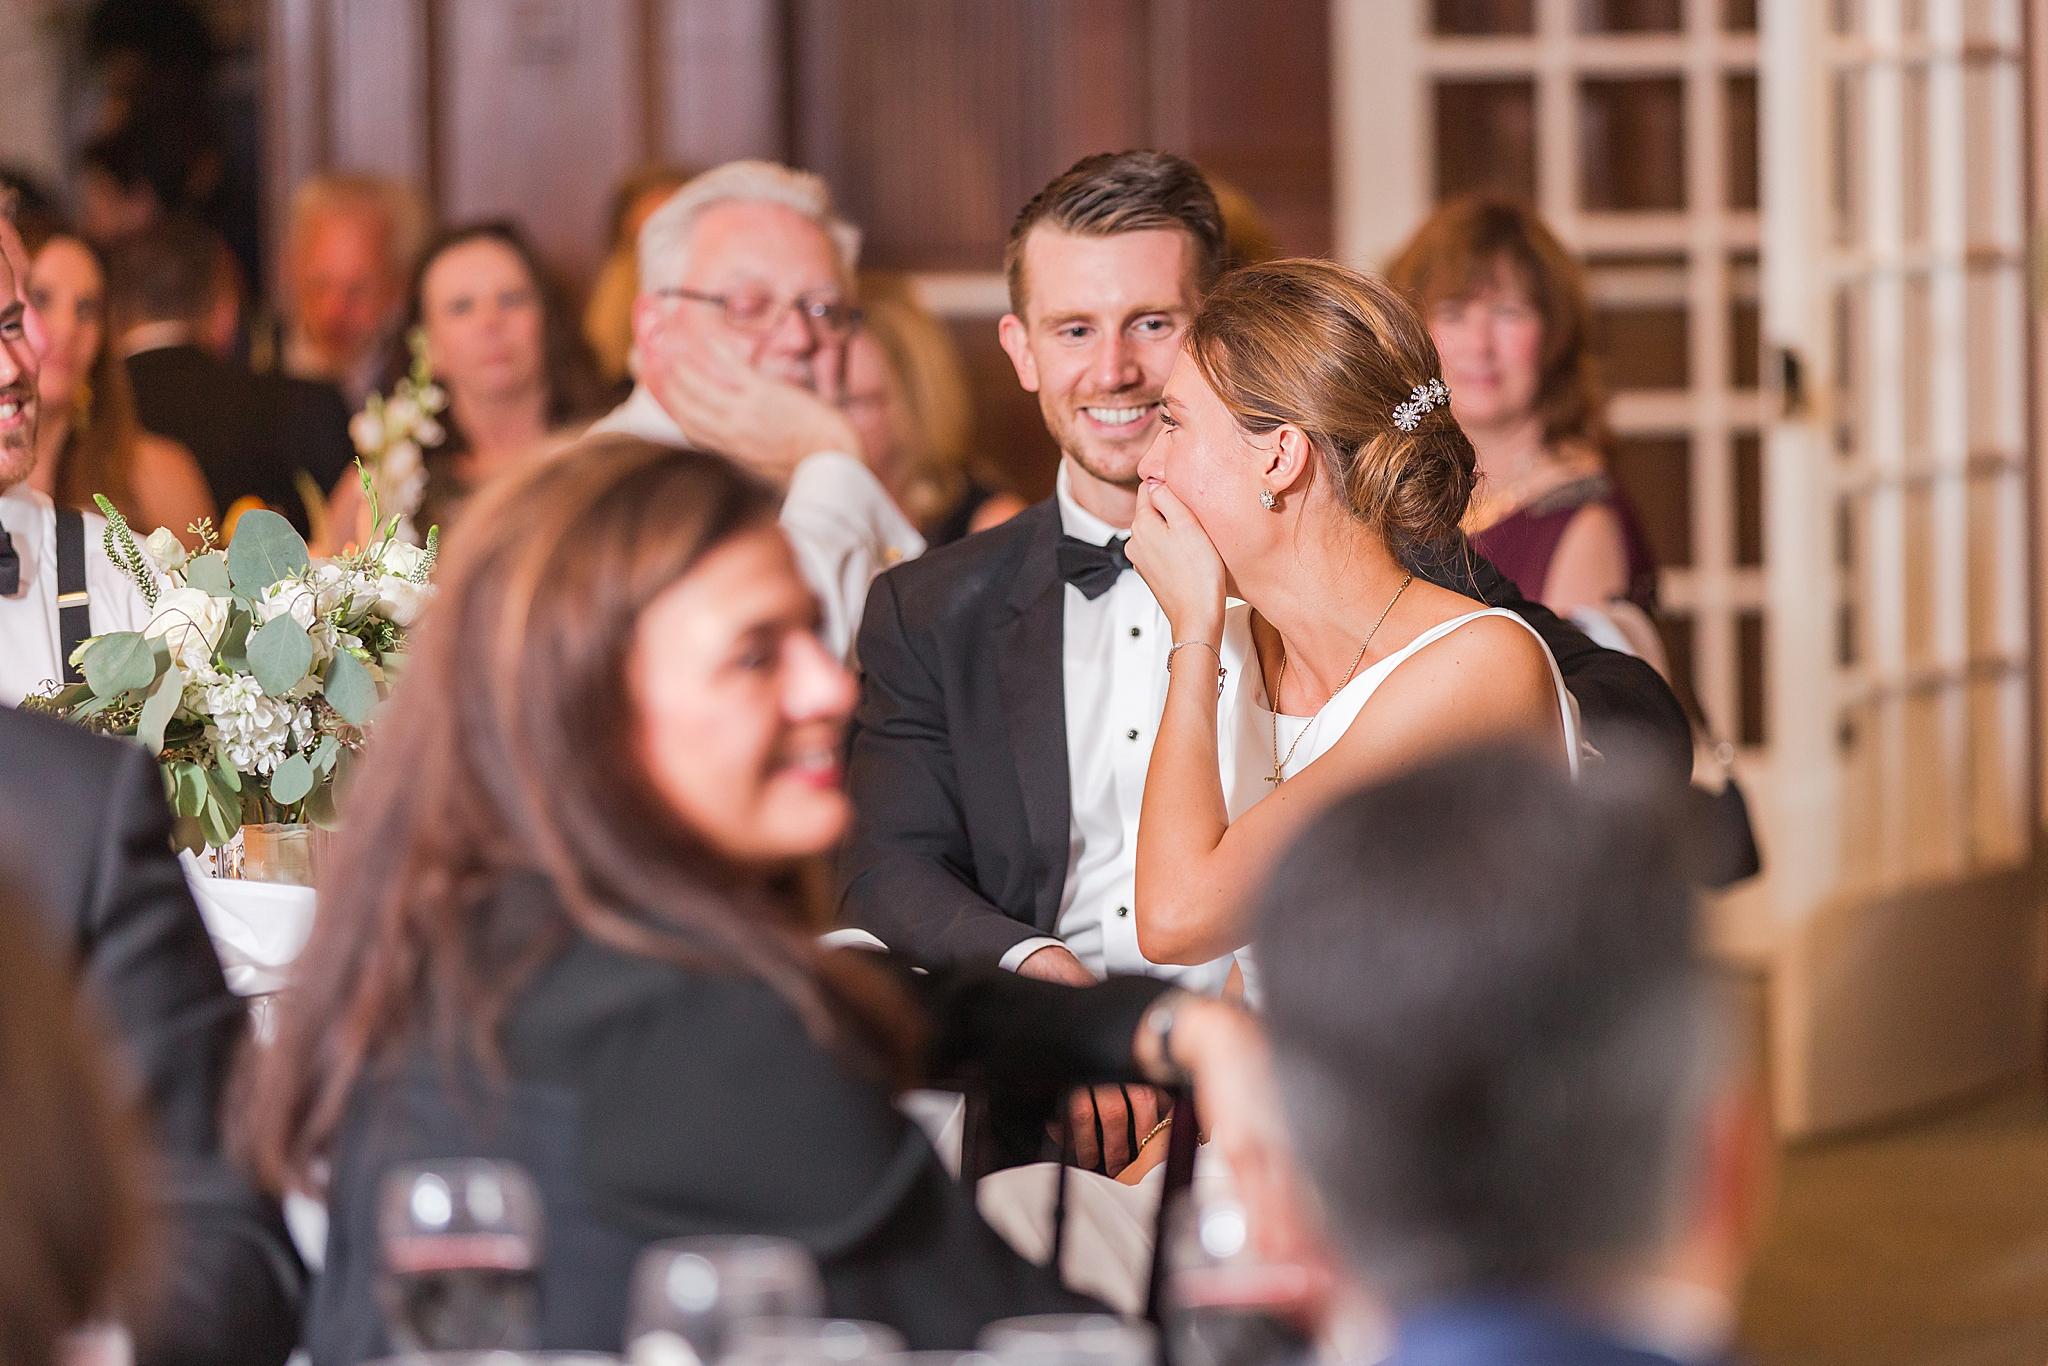 detroit-wedding-photographer-grosse-pointe-academy-chapel-detroit-golf-club-wedding-carly-matt-by-courtney-carolyn-photography_0096.jpg